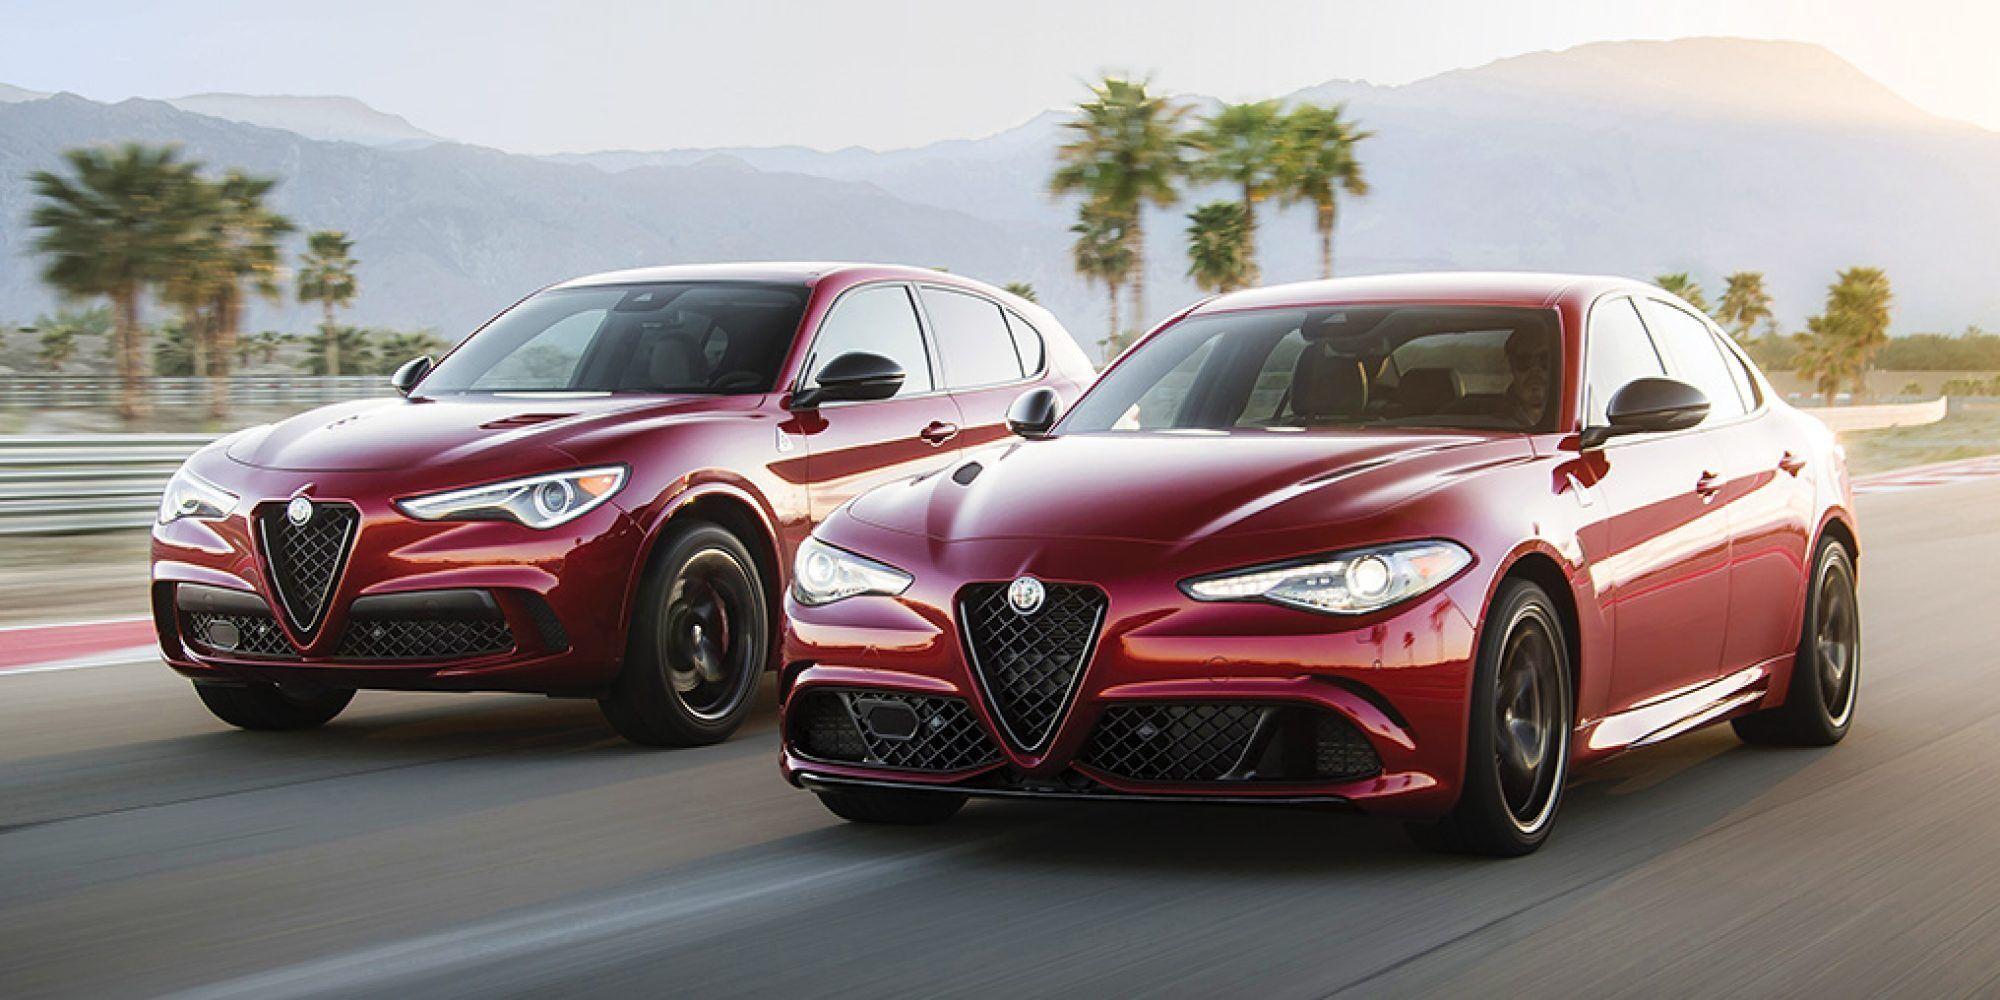 2019 Alfa Romeo Giulia A Luxurious World Class Sports Sedan Alfa Romeo Giulia Alfa Romeo Alfa Romeo Stelvio